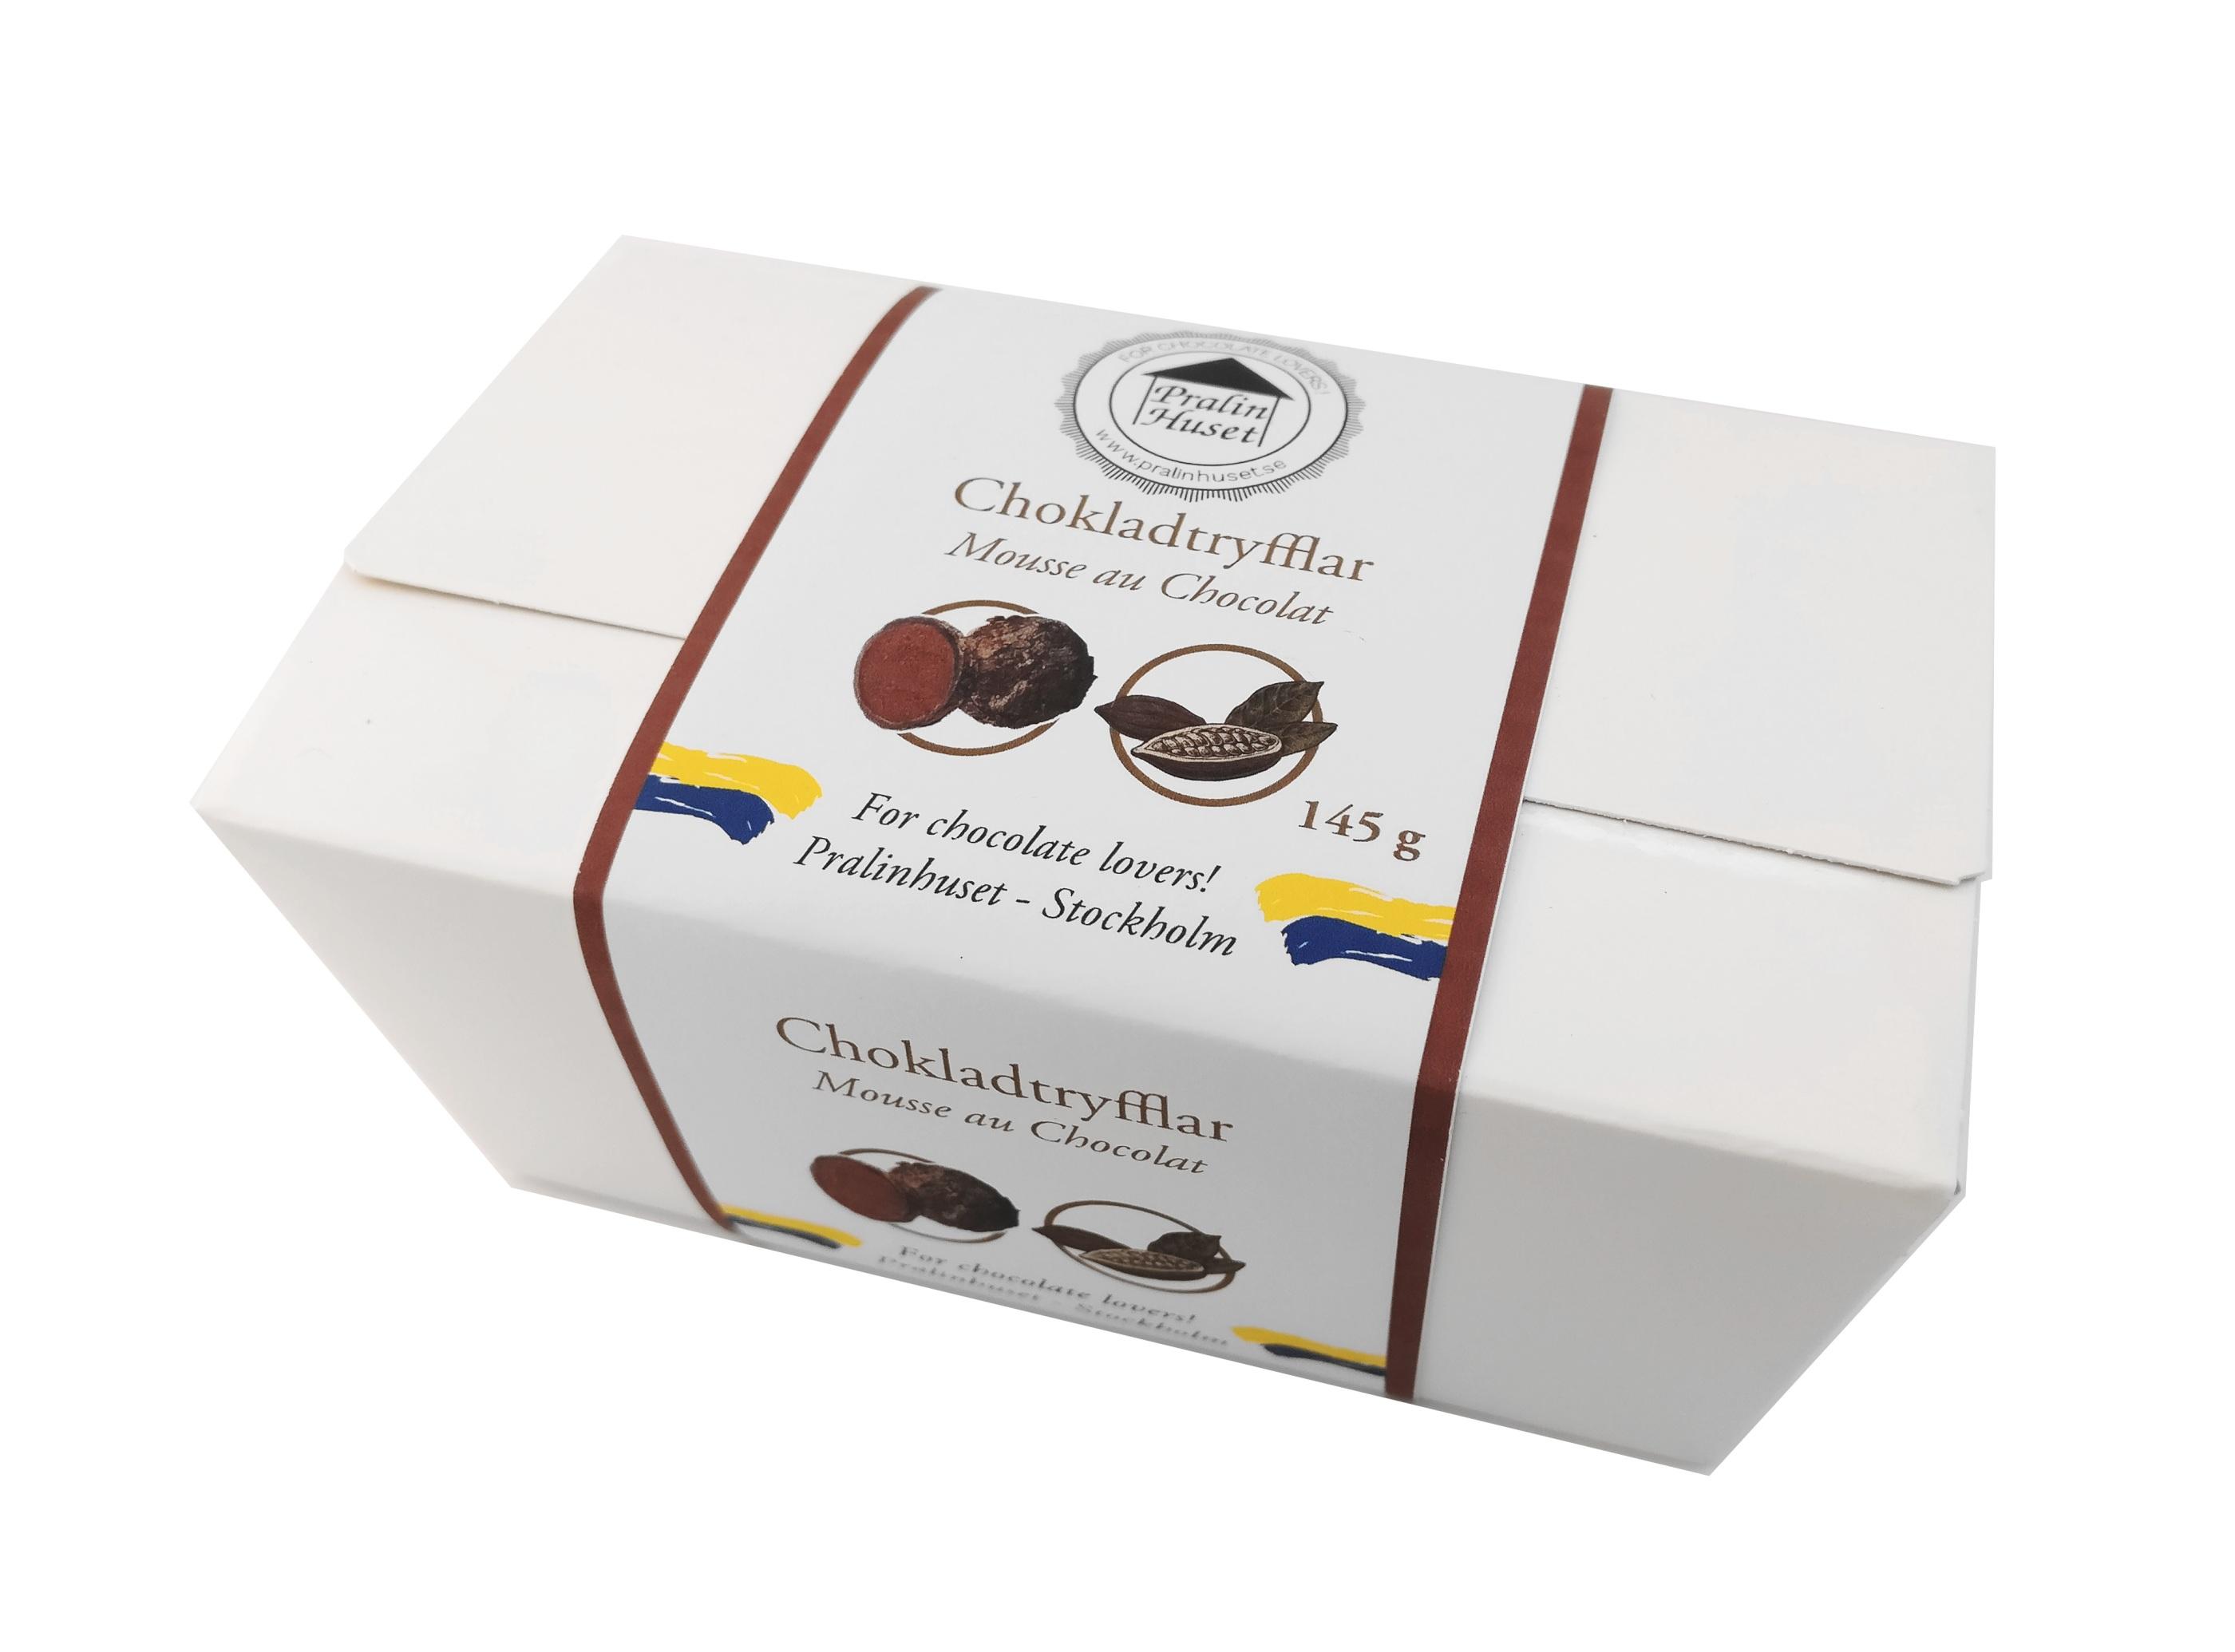 Chokladtryfflar_ask